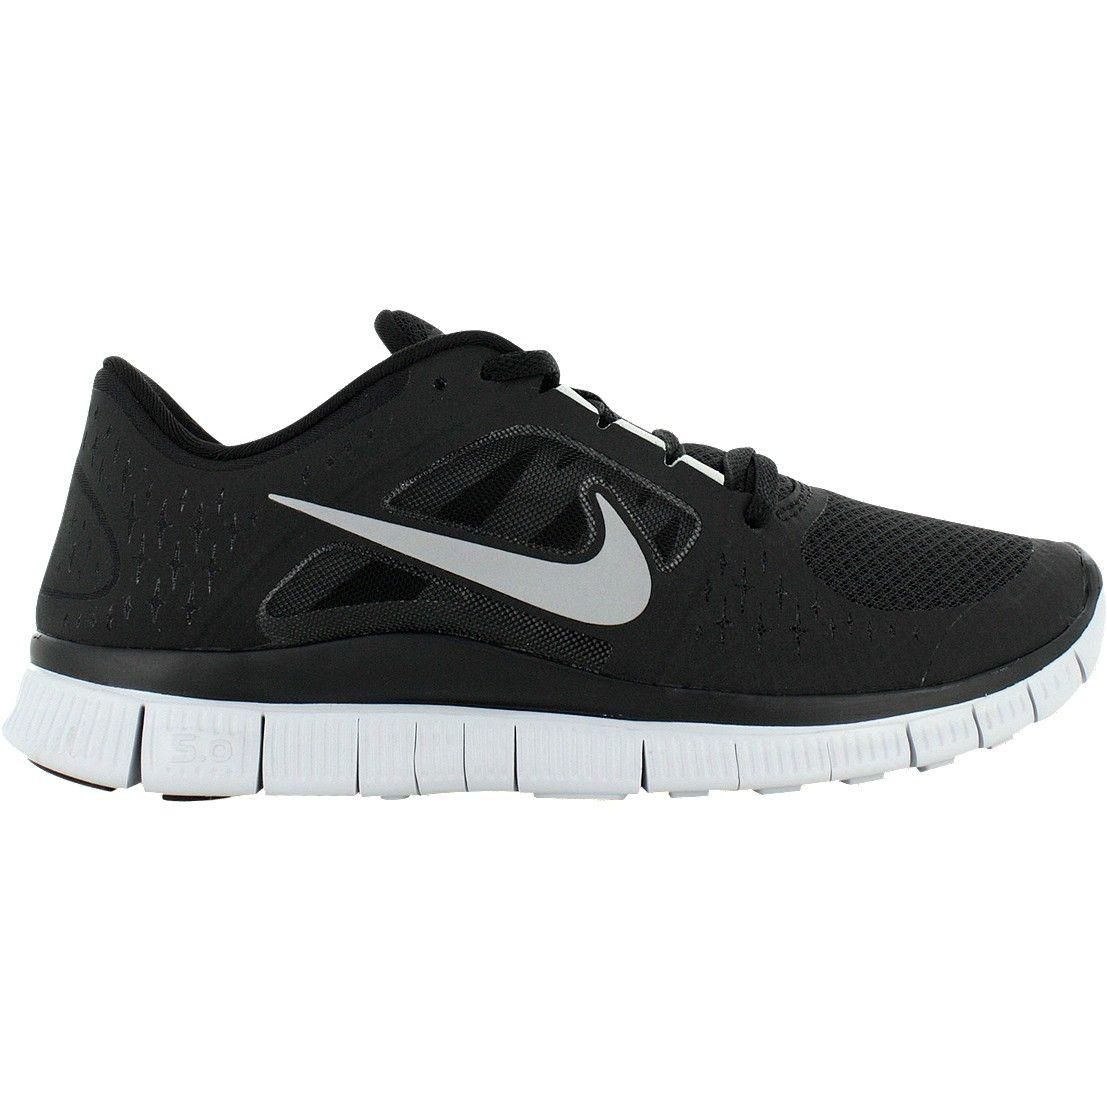 Running shoes · NIKE FREE RUN+ 3